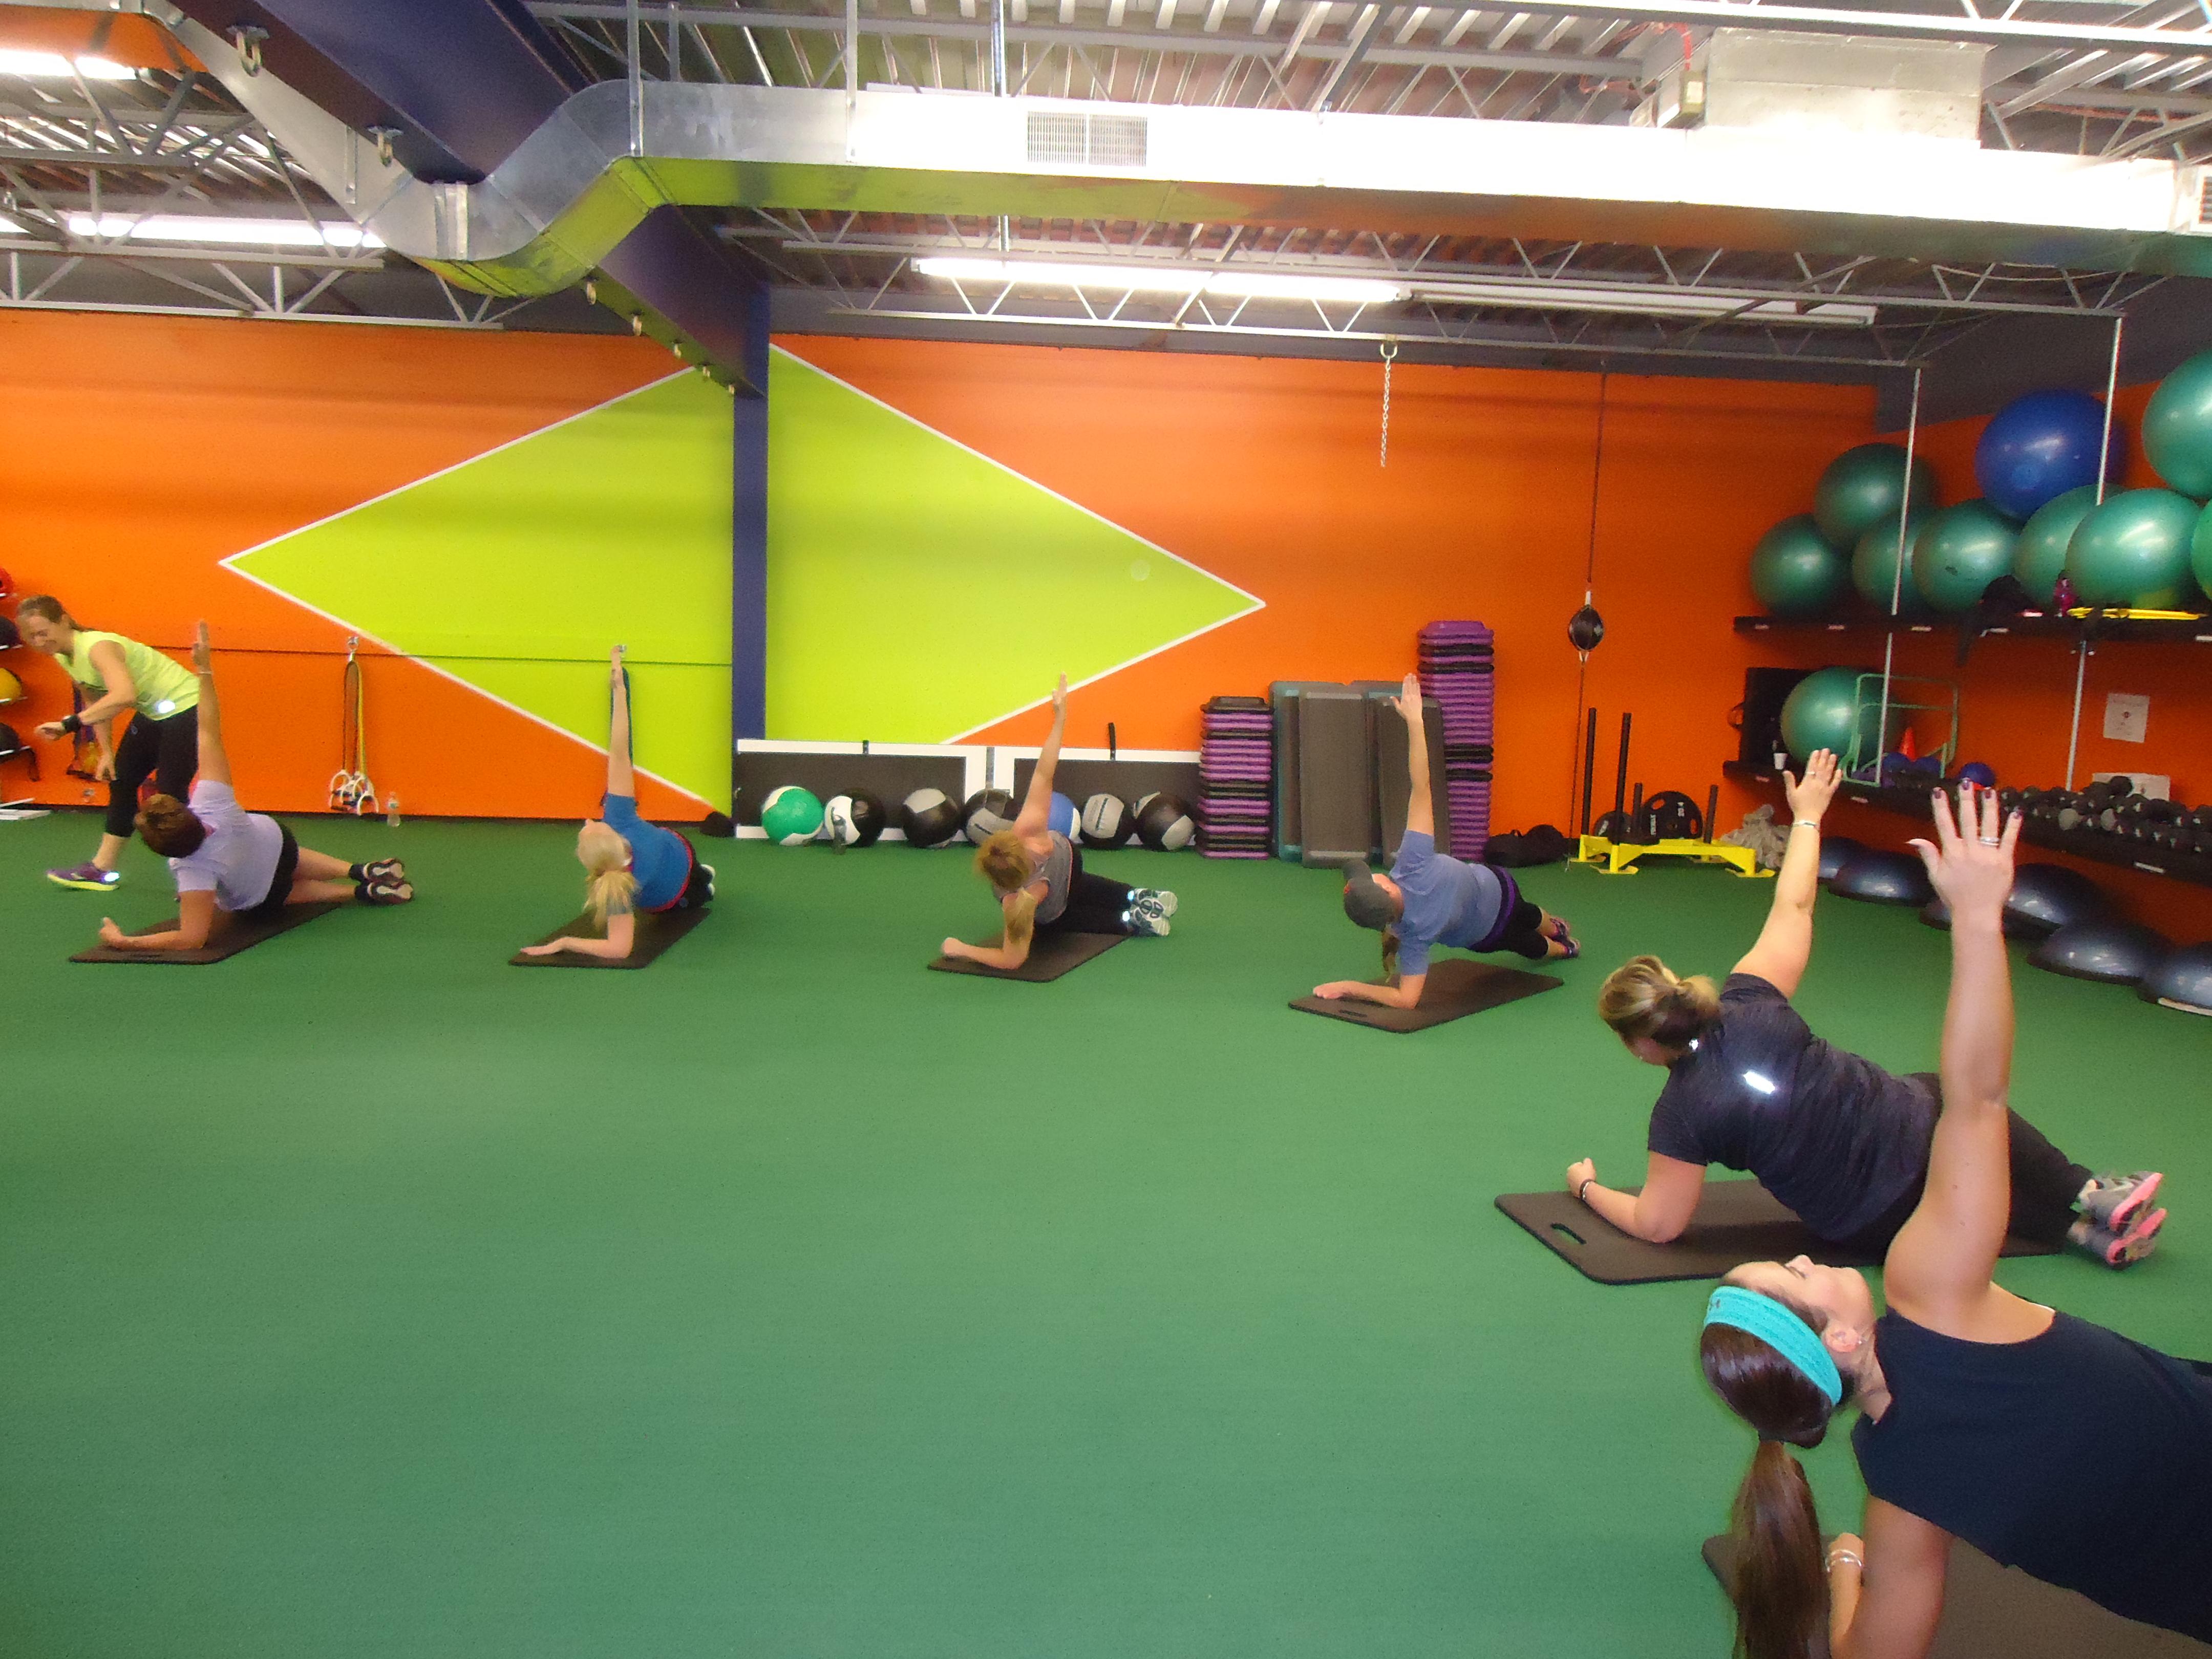 Everybodys Fitness Center image 7